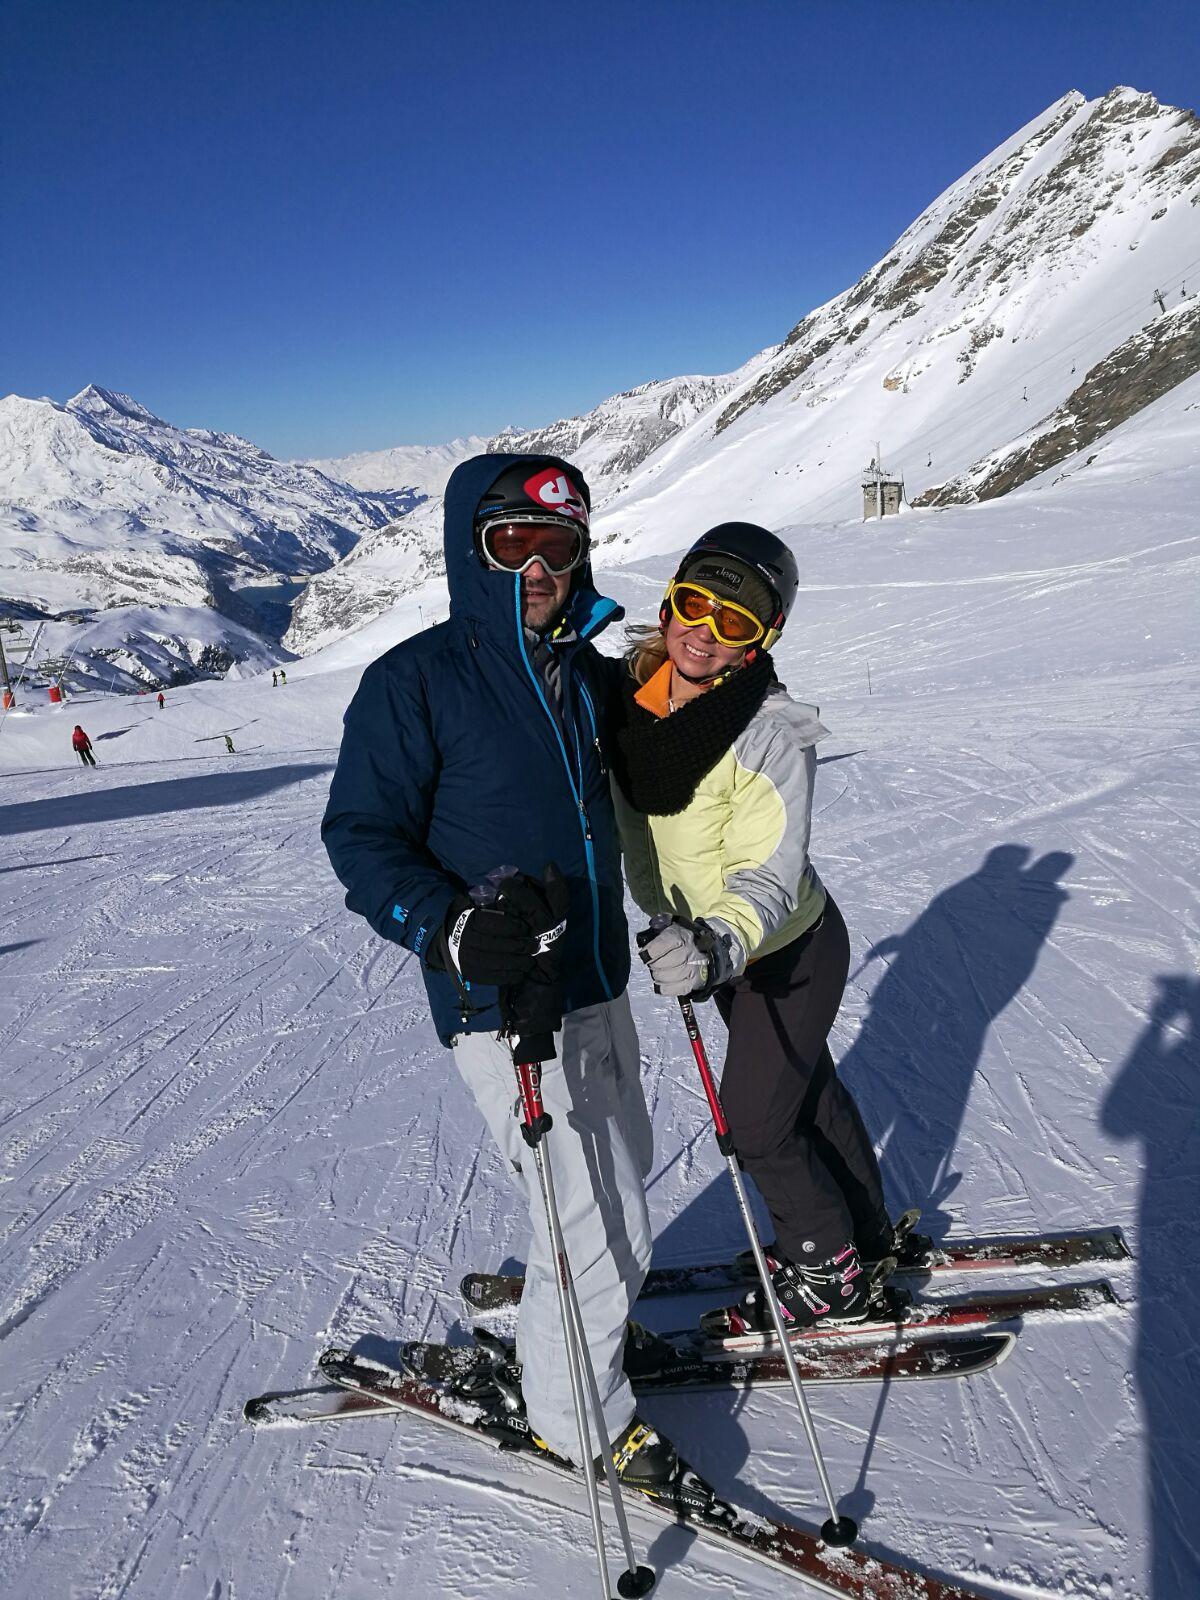 Best ski resorts in Europe, Val d'Isere